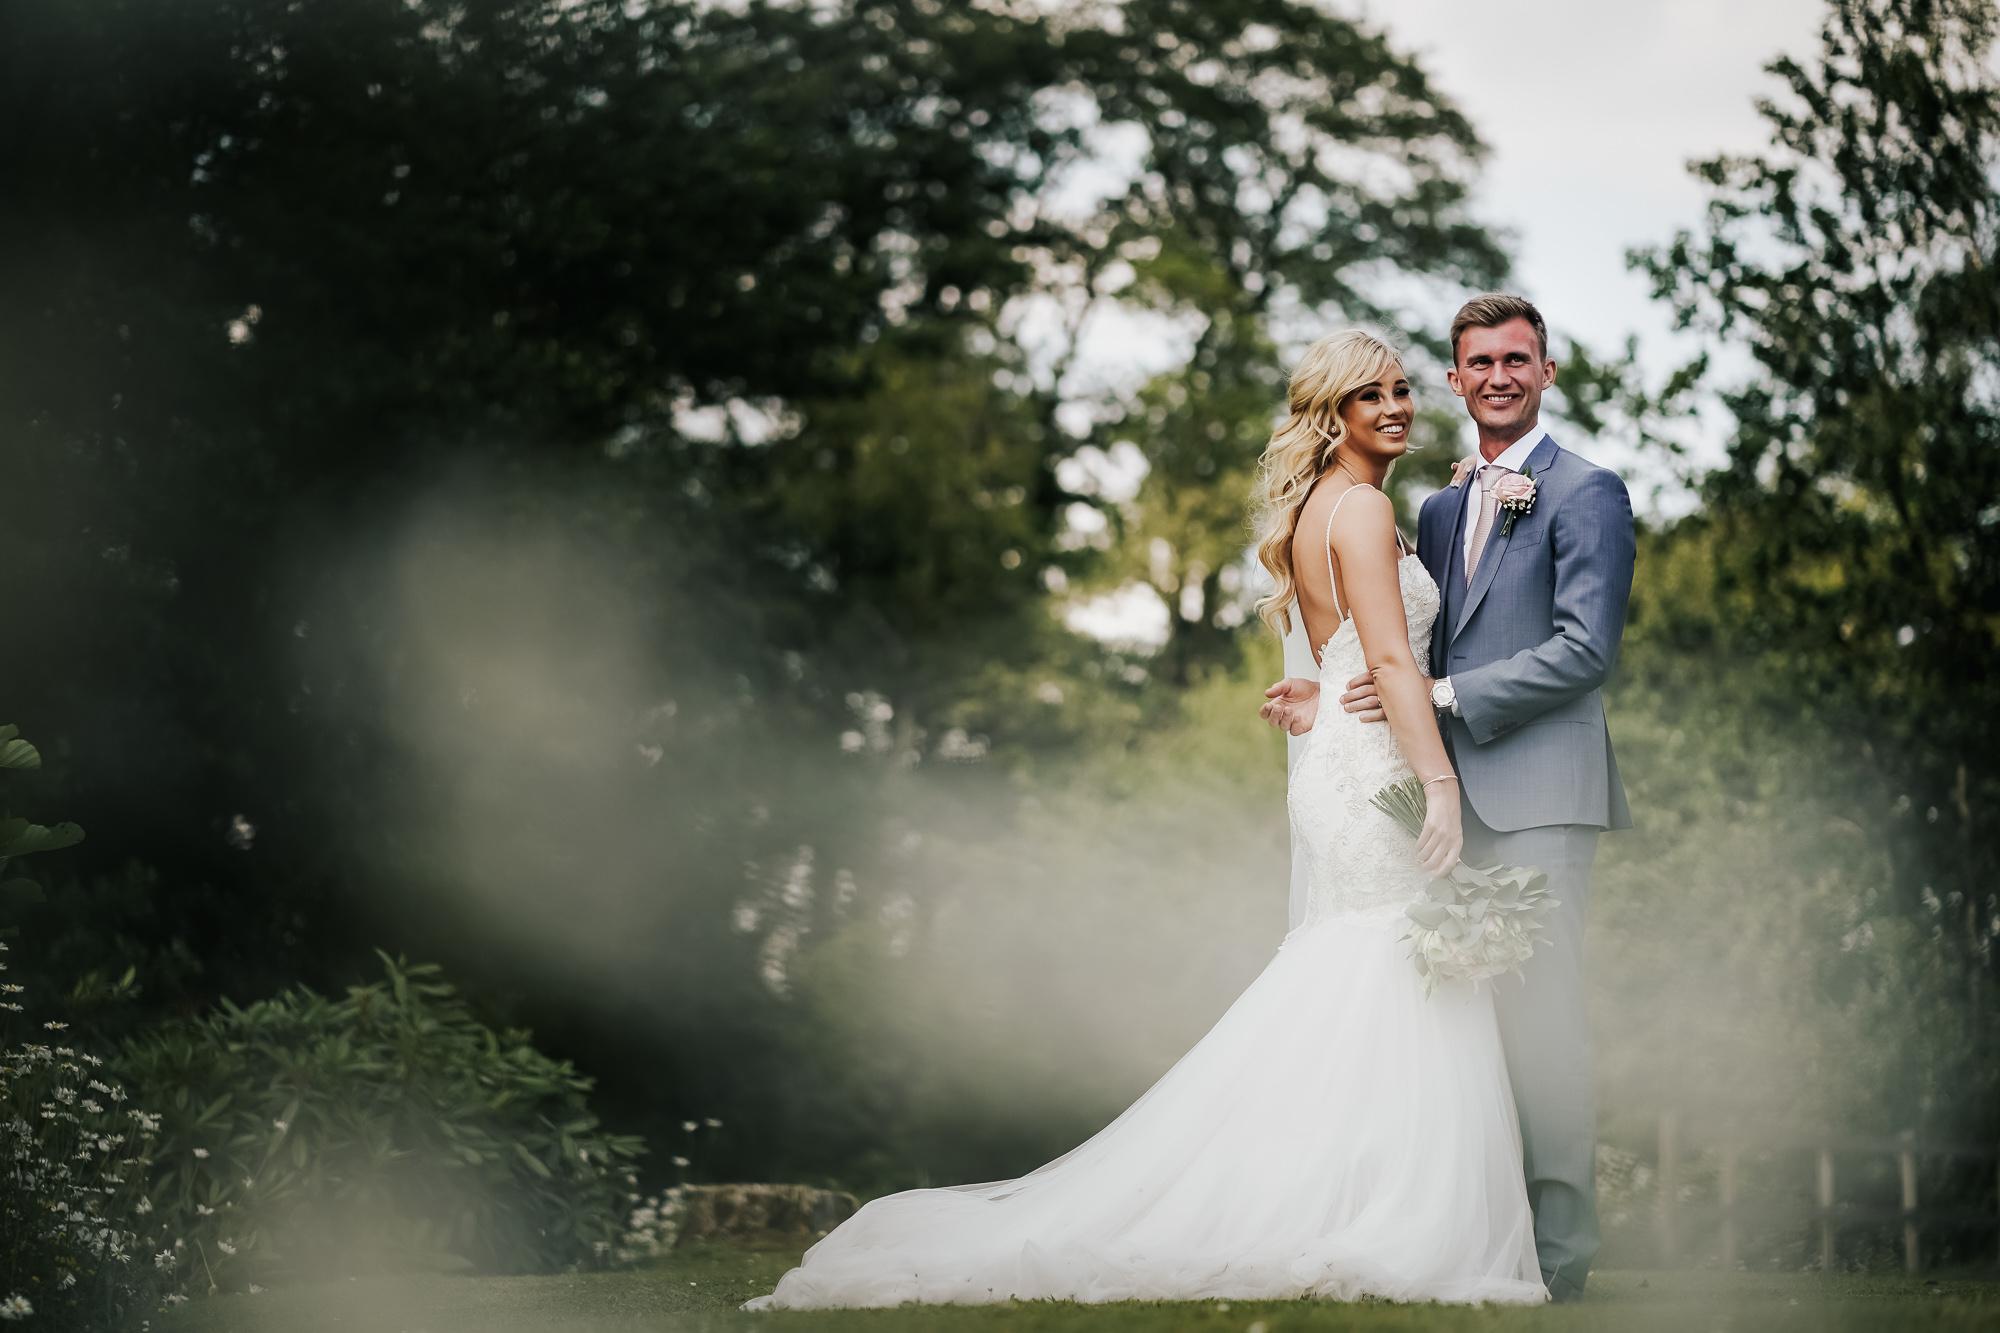 Thornton Manor Lakeside Marquee Wedding Photographer  (38 of 53).jpg